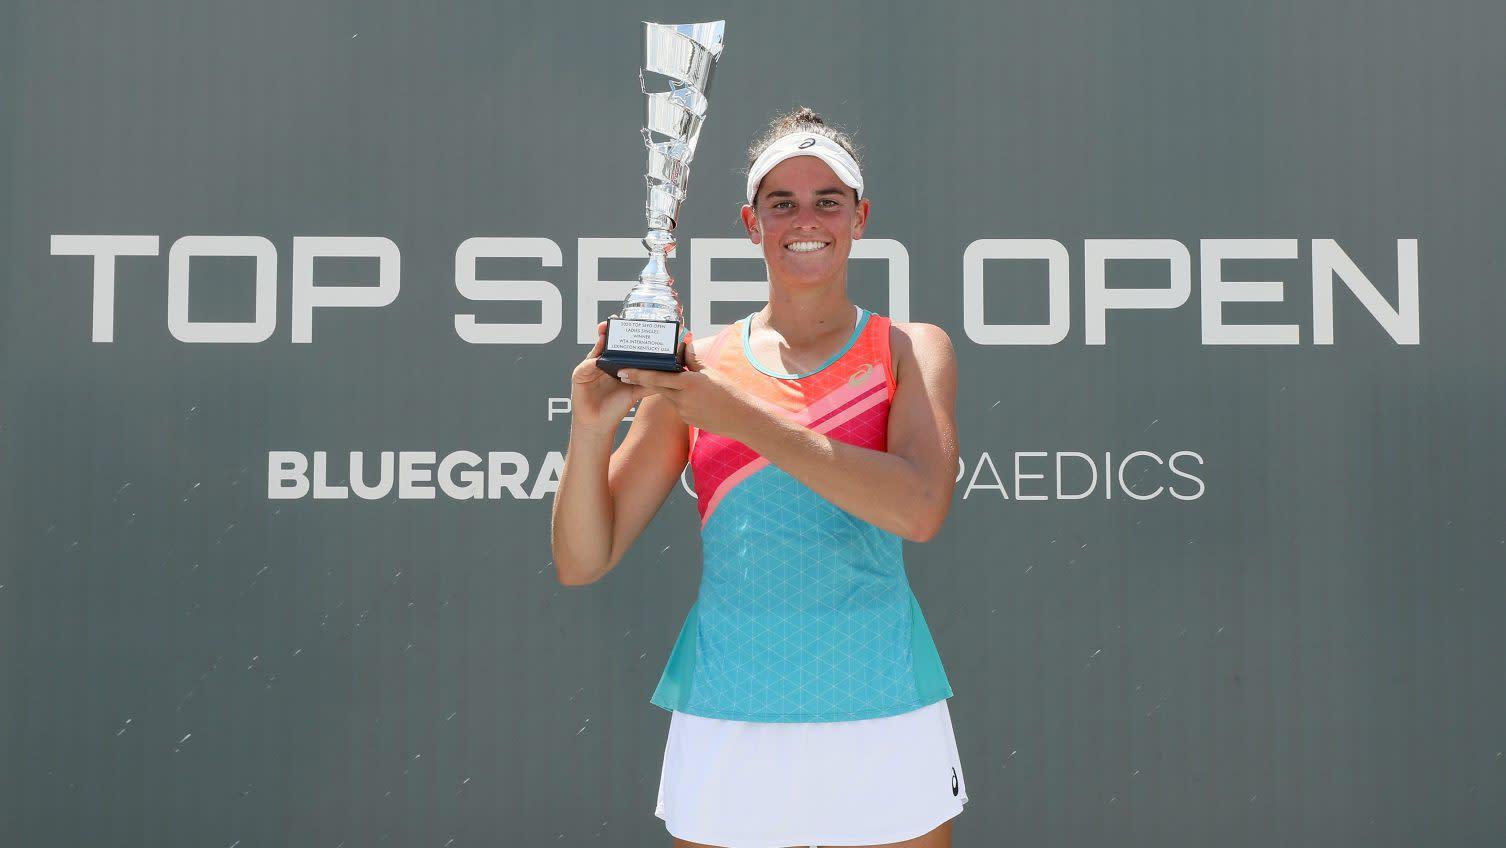 Jennifer Brady preps for U.S. Open by winning first tour title